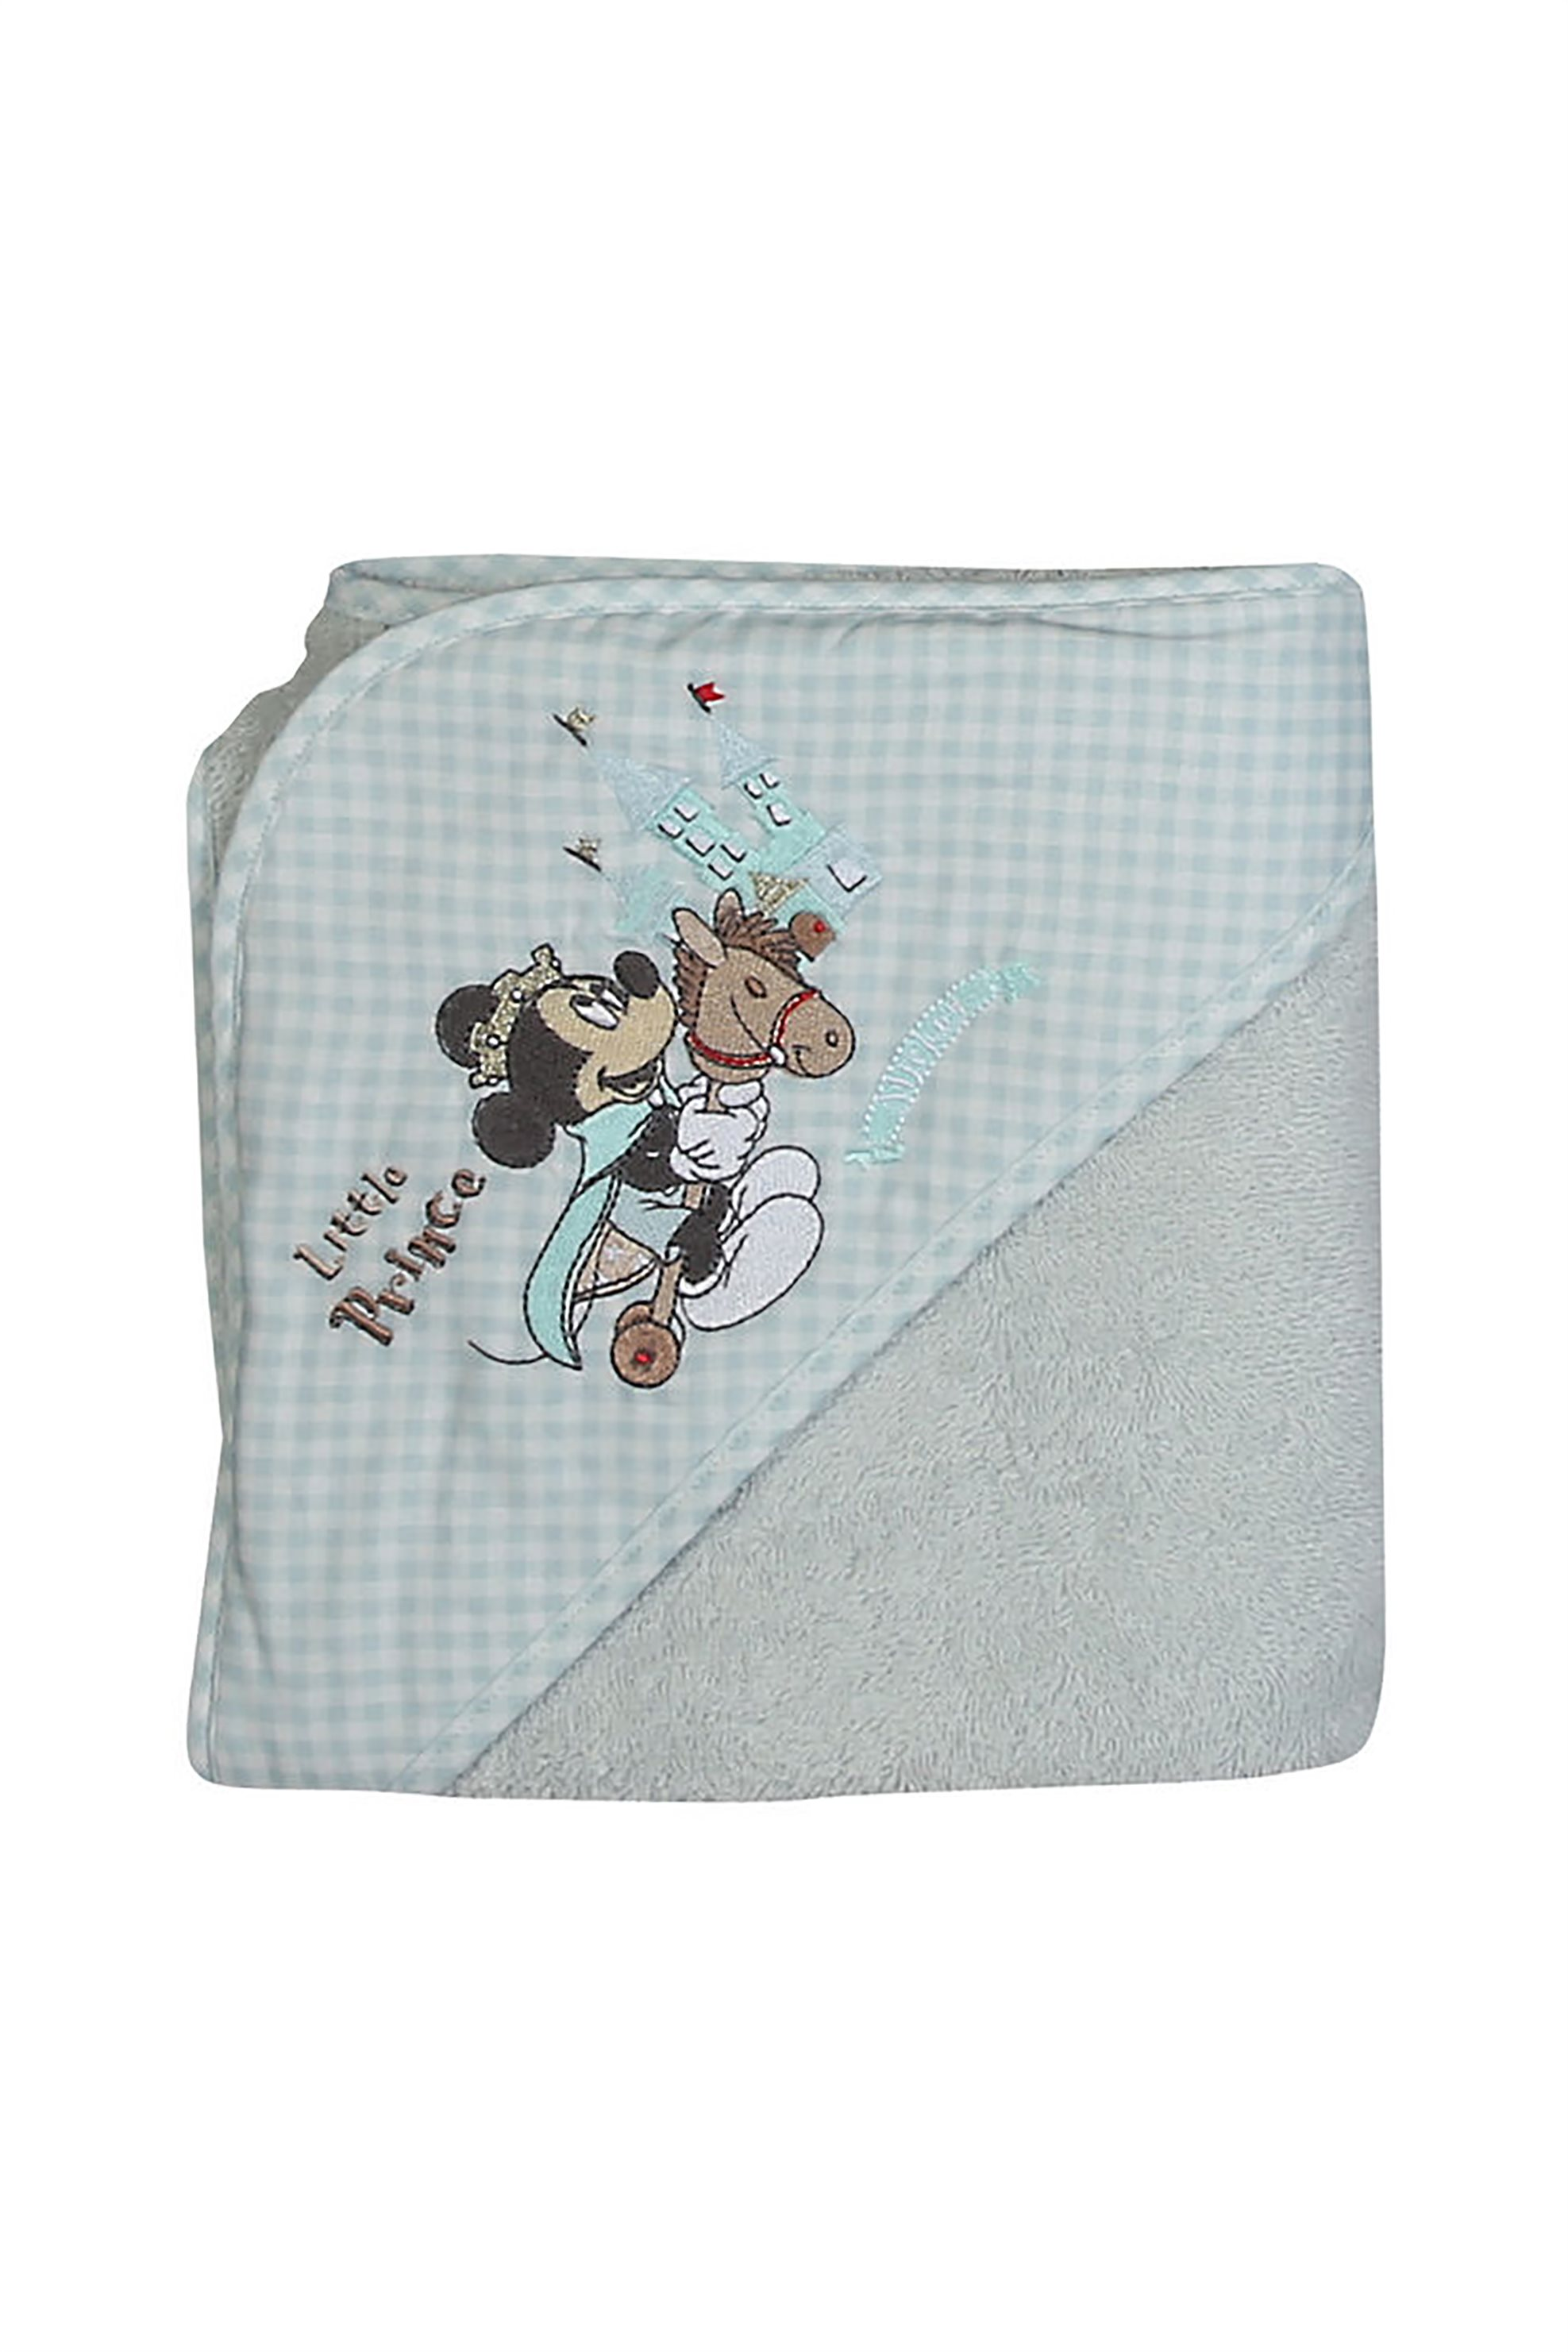 NEF-NEF Βρεφική κάπα Mickey Prince (75x75)  - 021596 - Γκρι Γαλάζιο home   παιδια   πετσέτες   παιδικά μπουρνούζια   ρόμπες